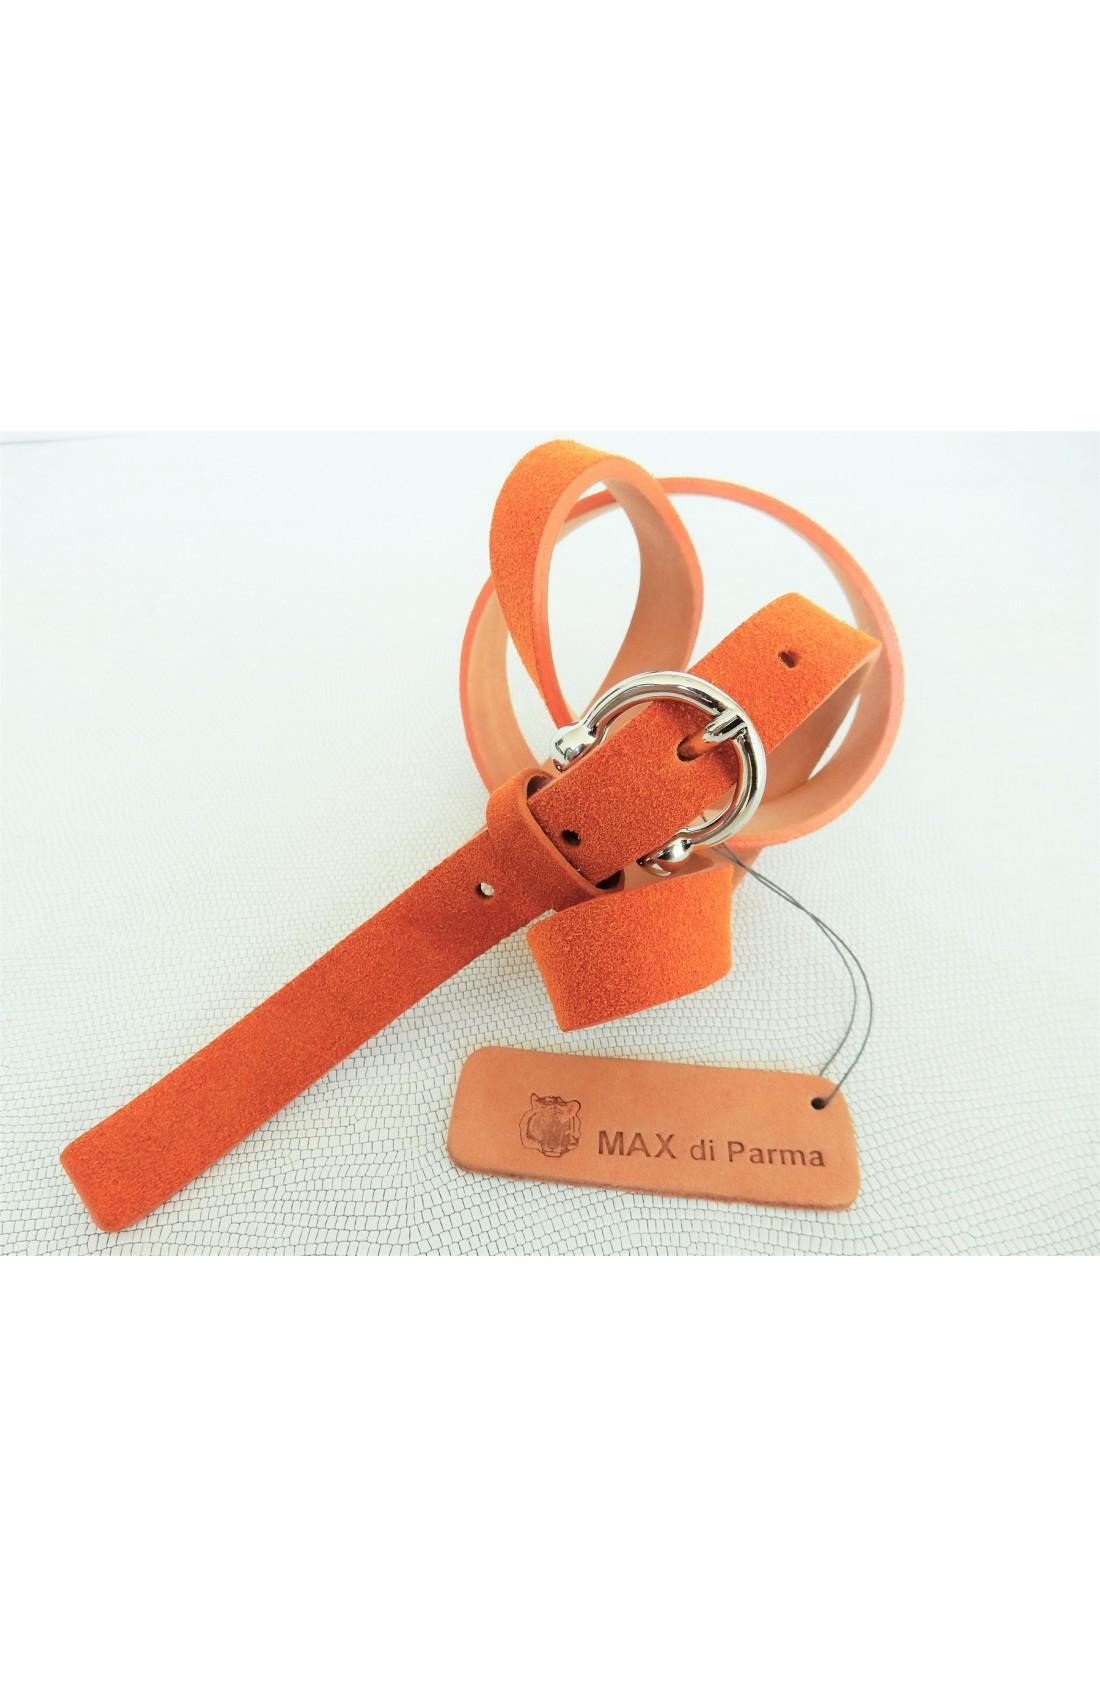 art. 601 SCAMOSCIATO mm.20 var.81 arancio mattone fibbia L 70 mm.20 nikel free (4)